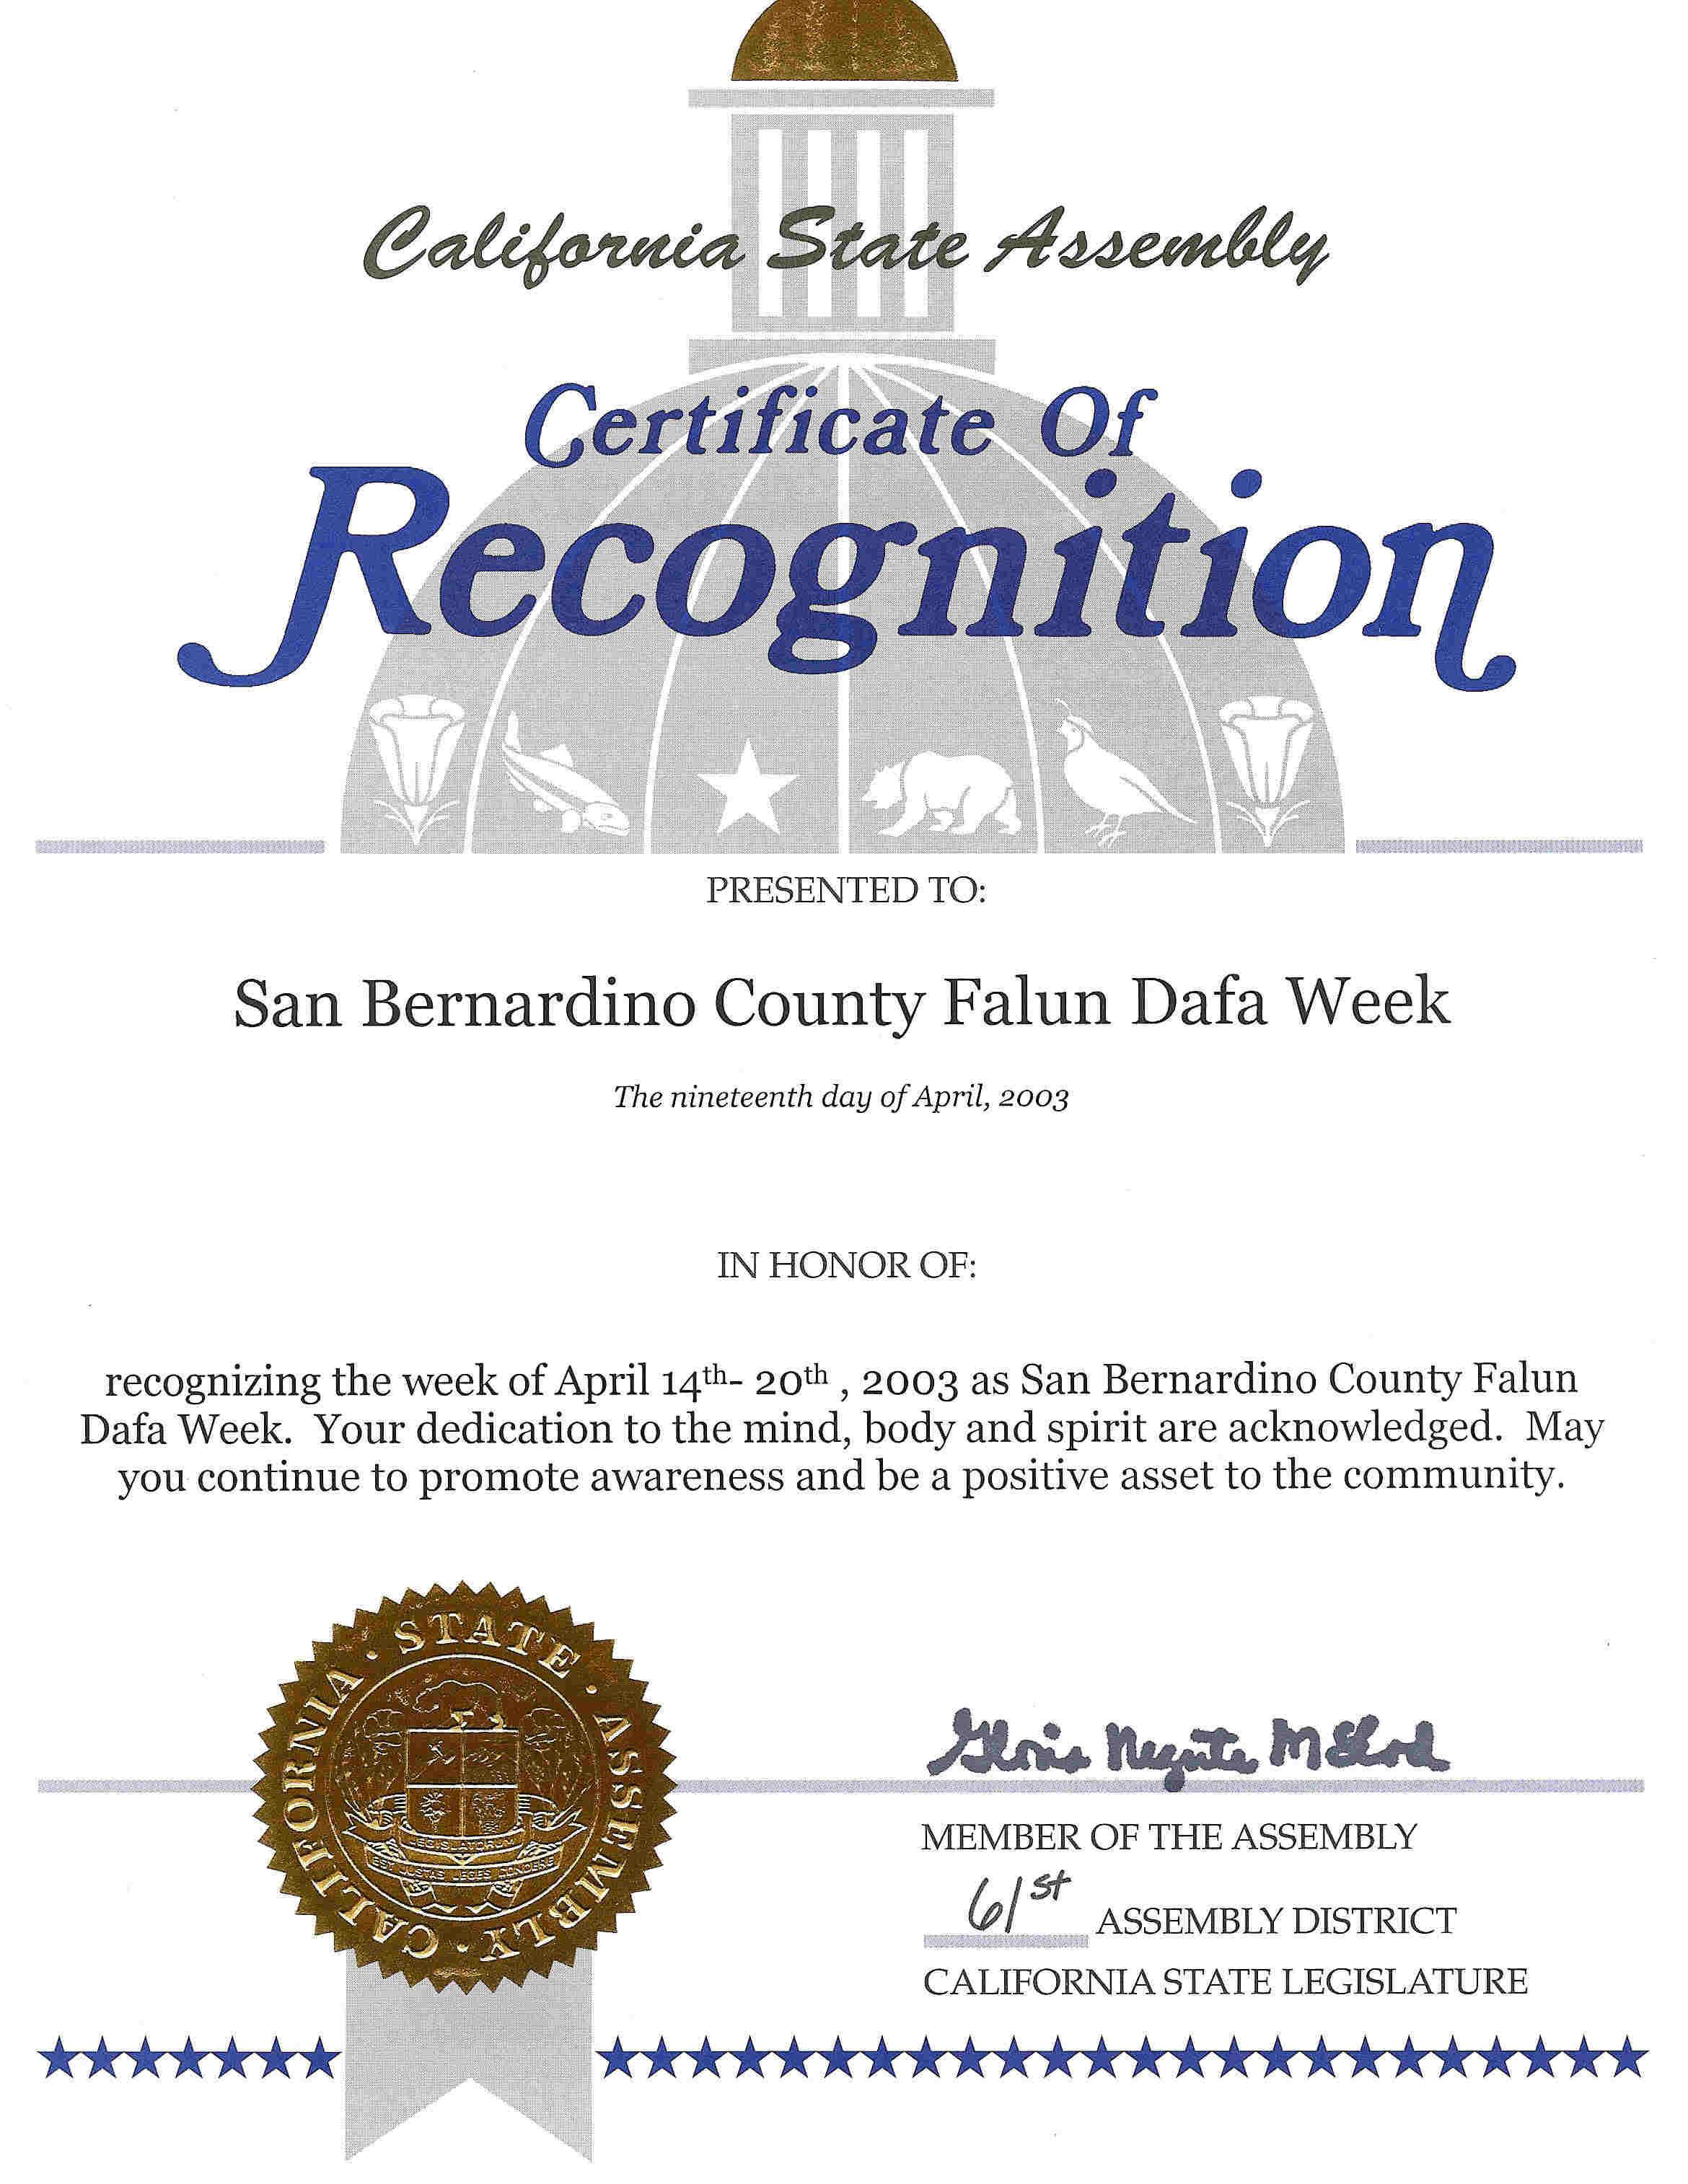 Awesome image of san bernardino birth certificate business cards certificate replacement california san bernardino county aiddatafo Gallery